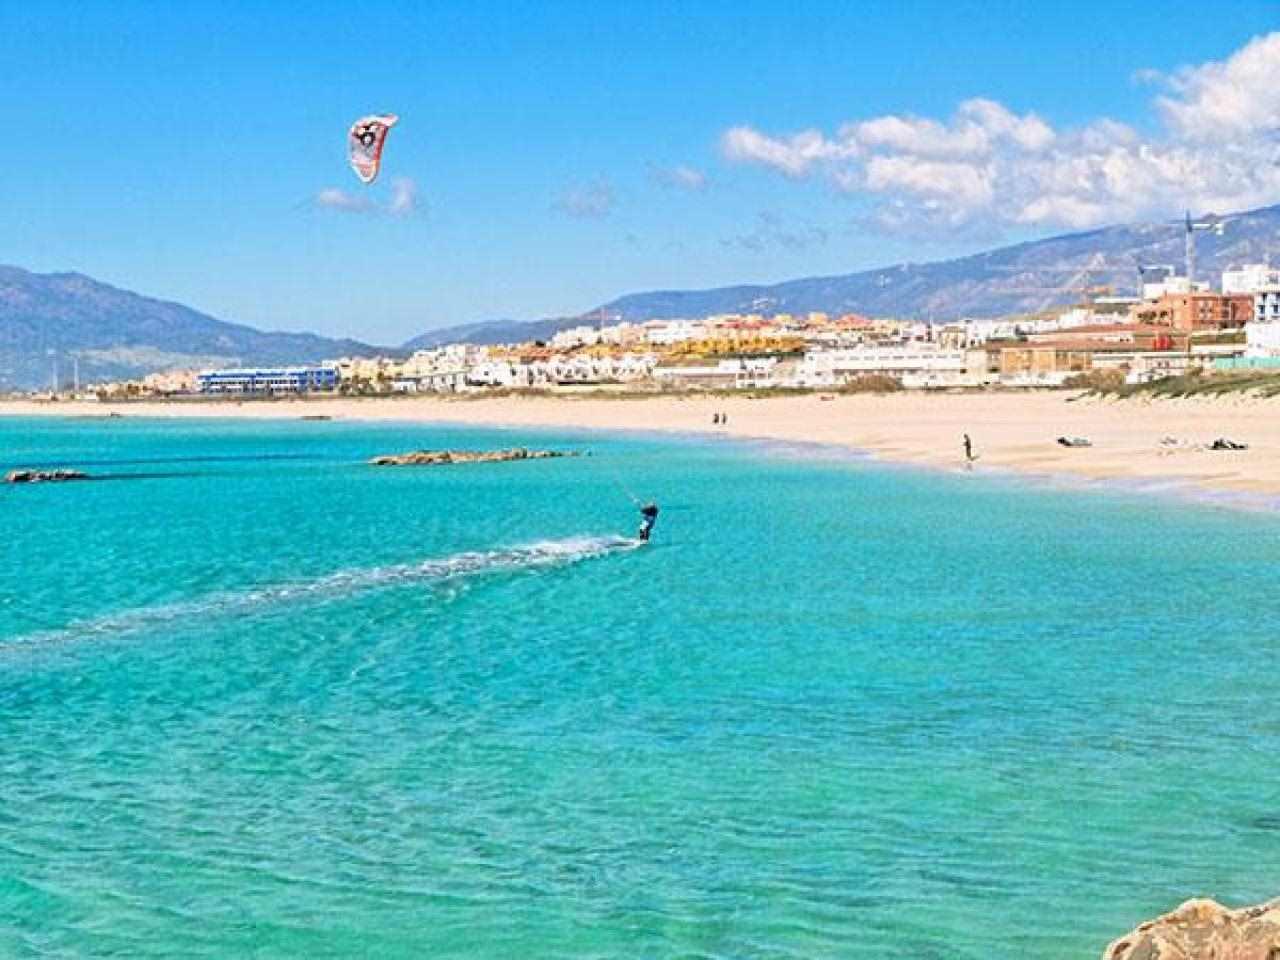 Apartamento barato para vacaciones Tarifa, Cádiz